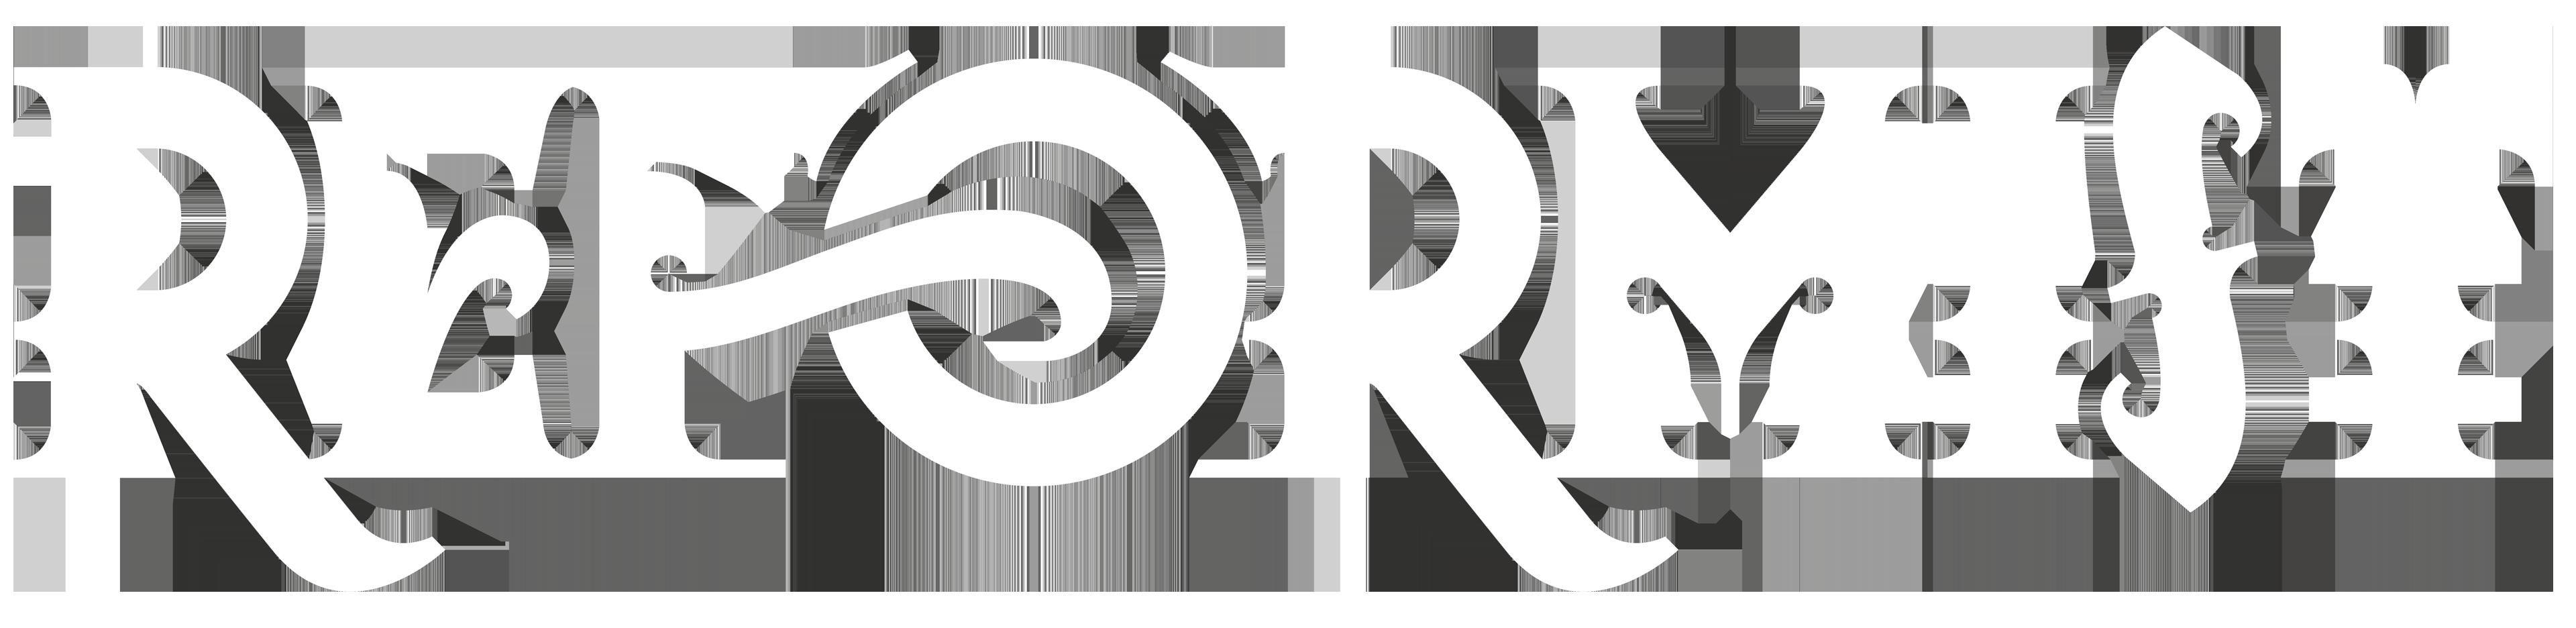 REFORMIST logo